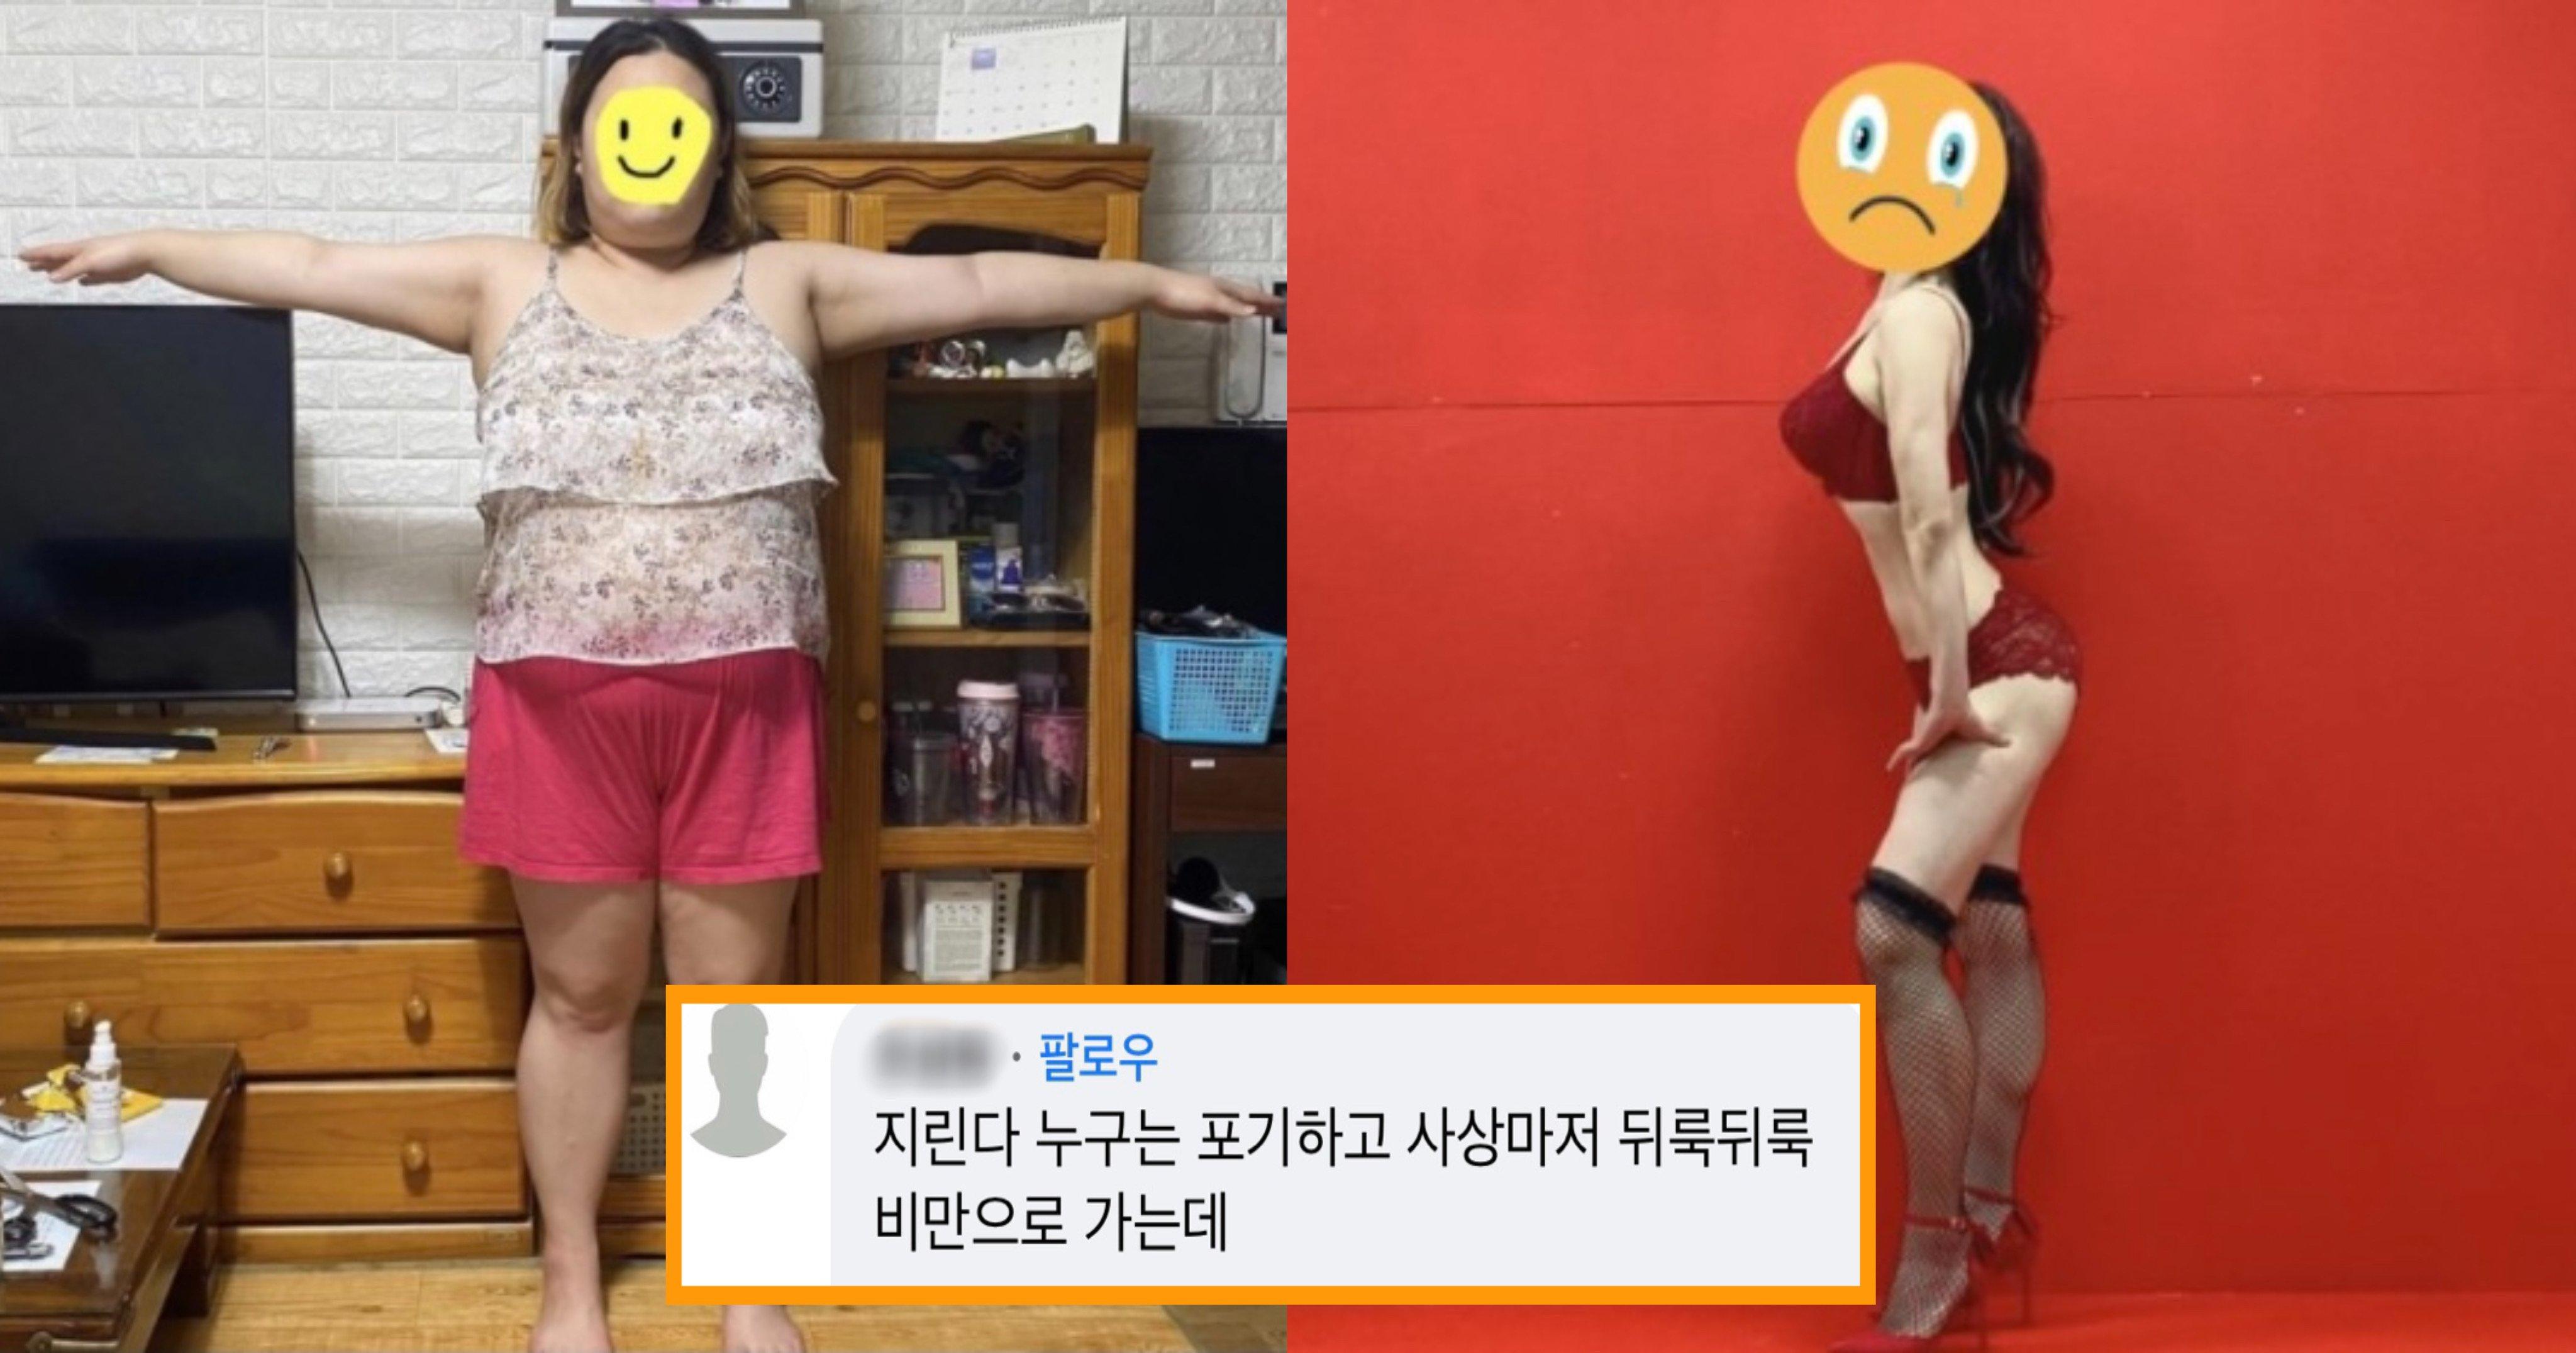 "5f842dd2 5871 4b0c b316 c24ebcdb5202.jpeg?resize=1200,630 - ""몸매 역대급..""..현재 난리 난 몸무게 100kg에서 다이어트로 40kg 감량한 여성의 몸매(+사진많음)"